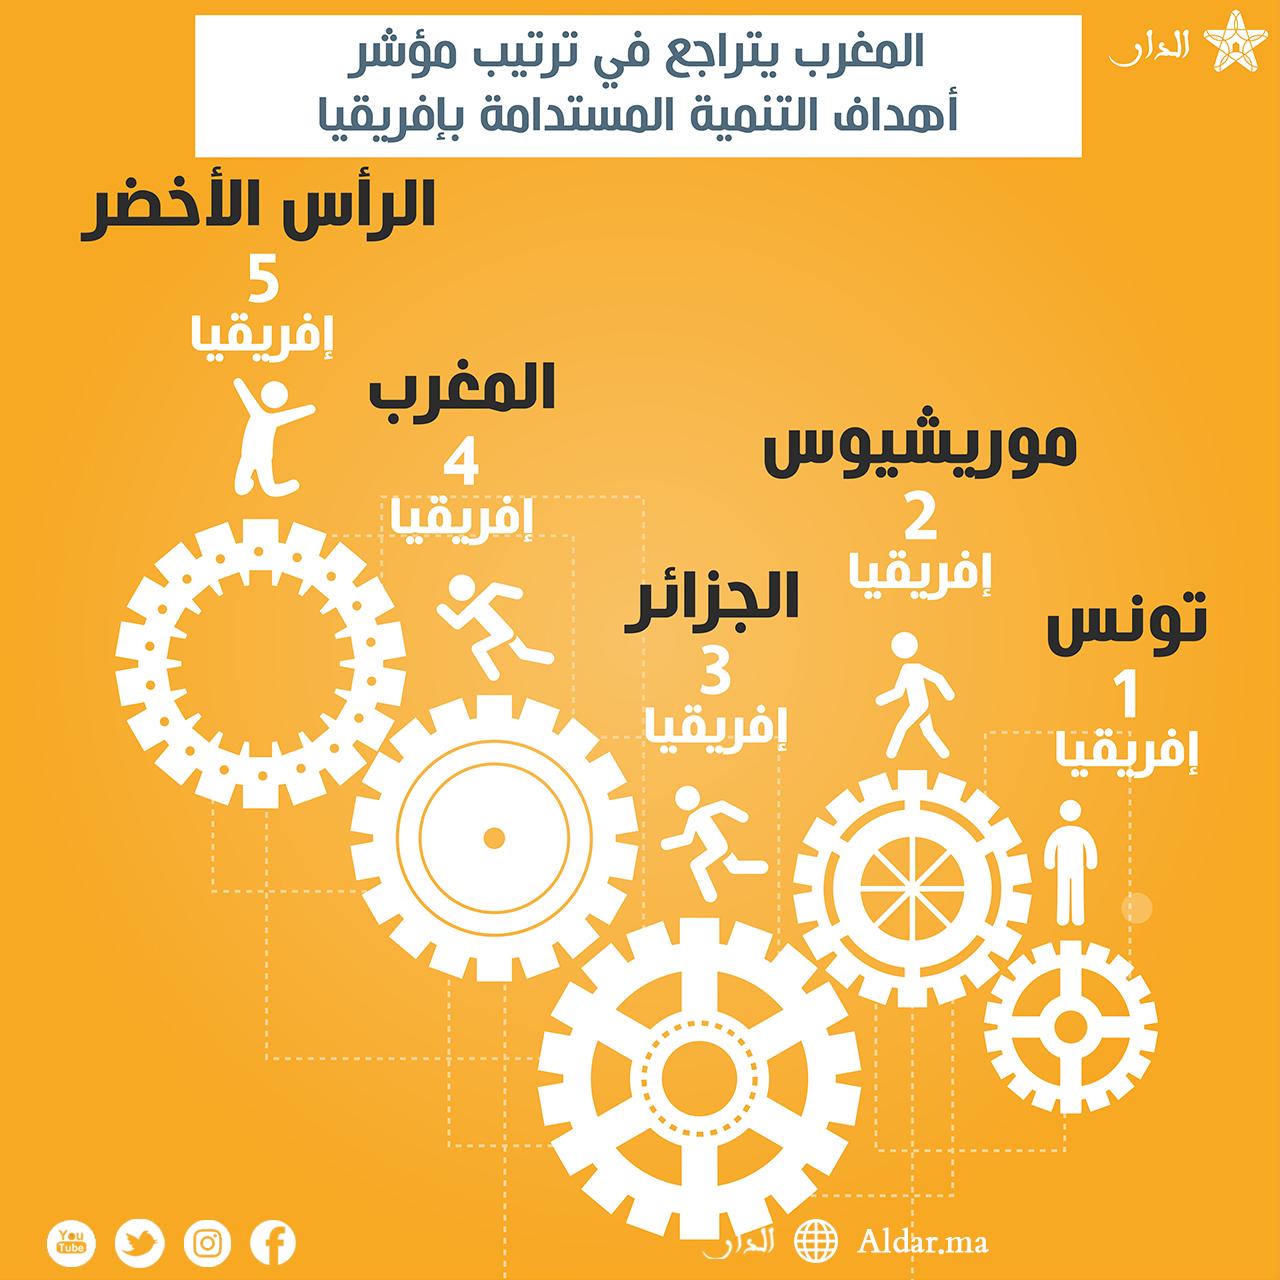 Photo of المغرب يتراجع في ترتيب مؤشر أهداف التنمية المستدامة بإفريقيا